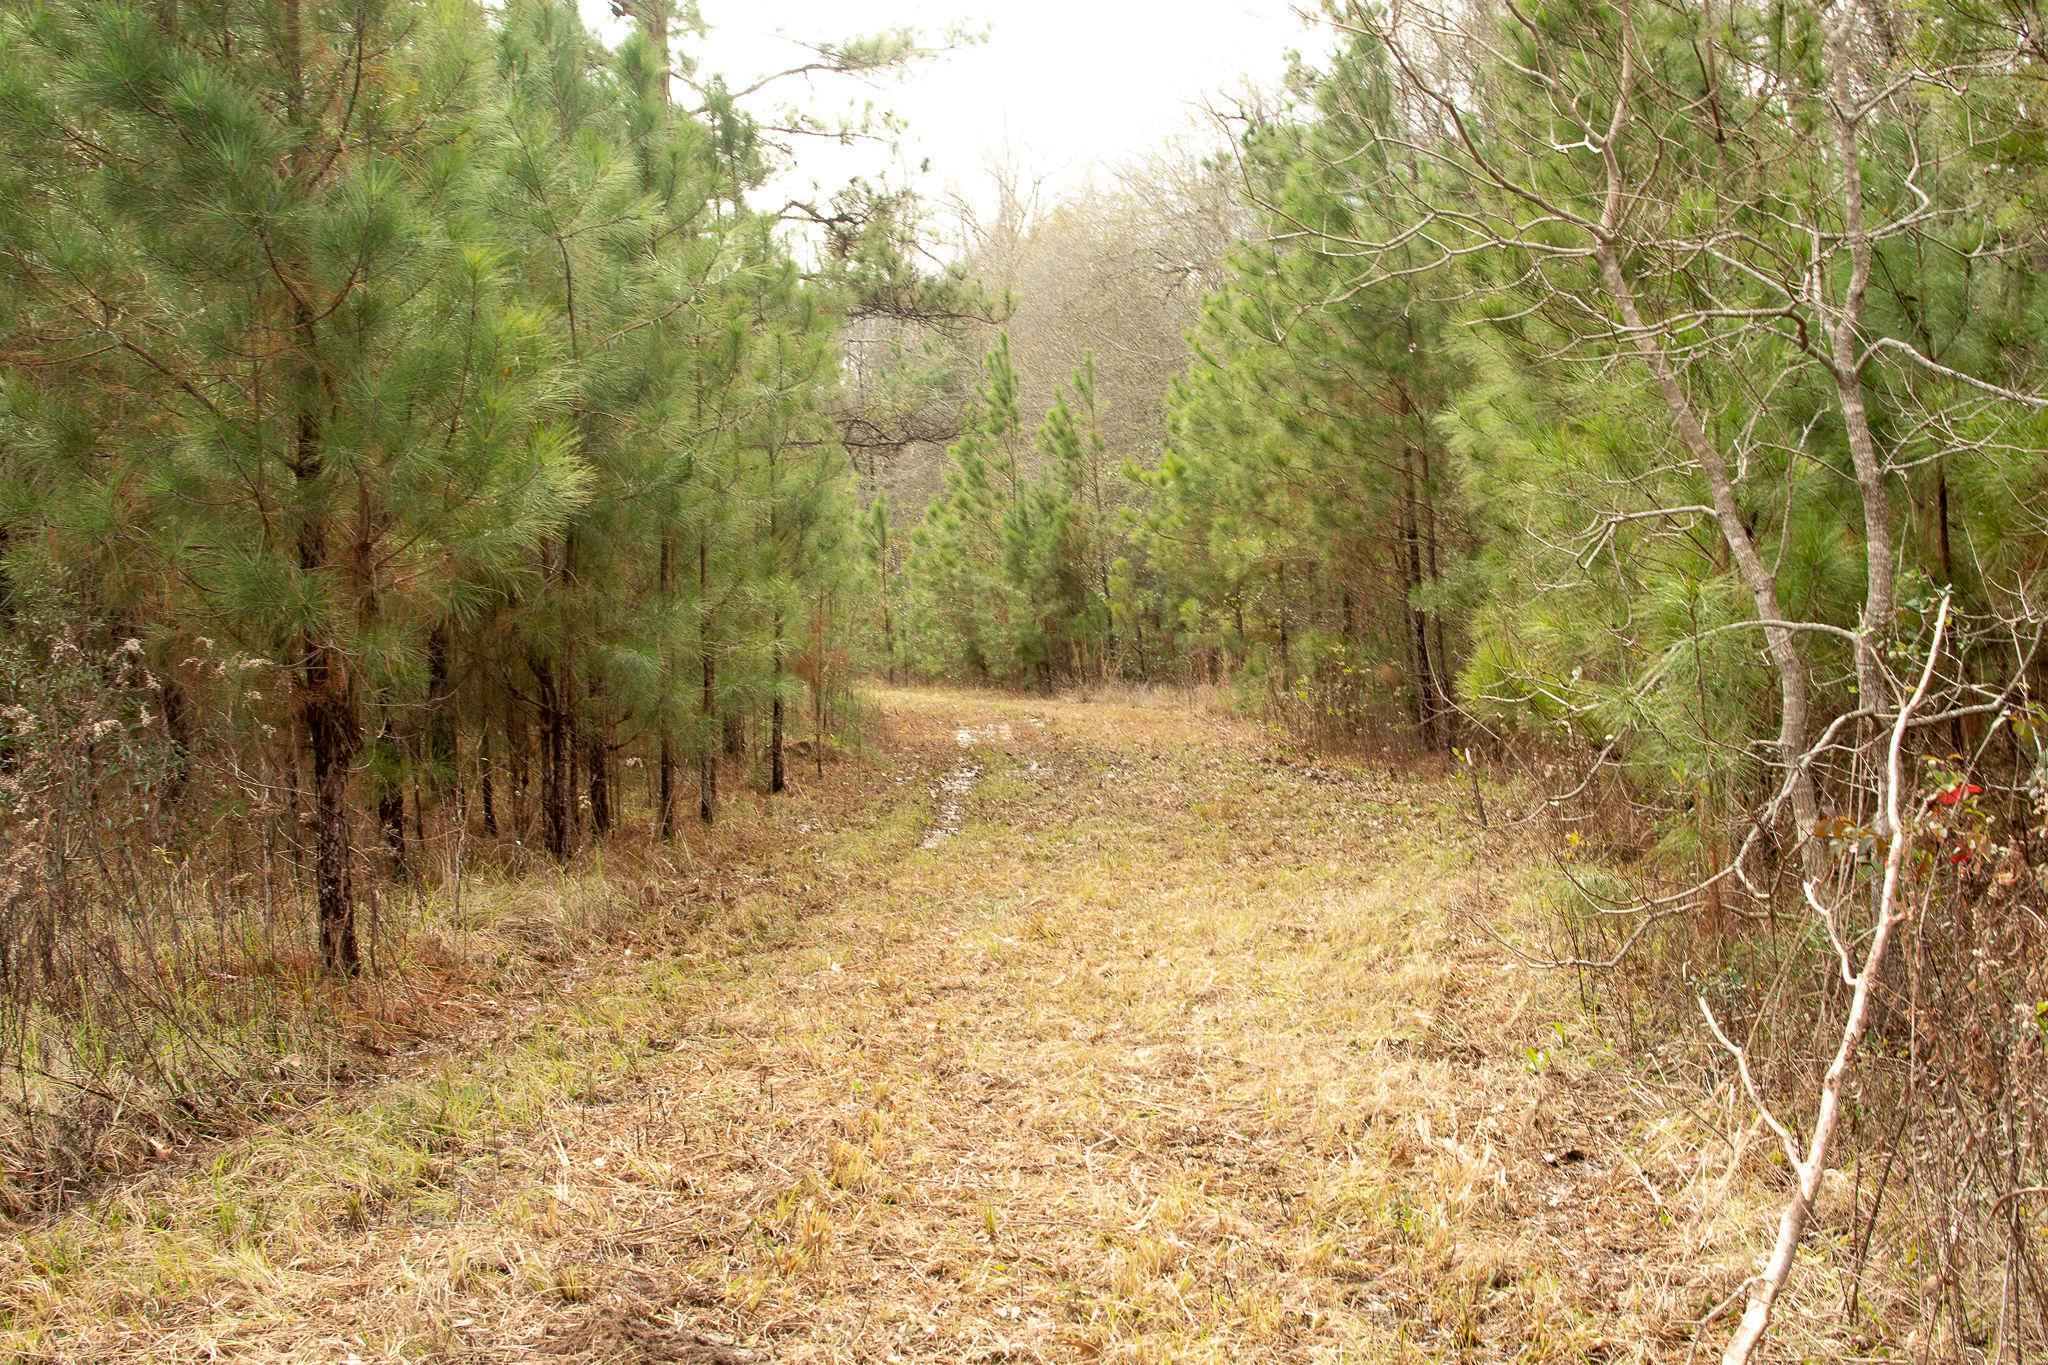 176 Smokey Cove Road Tract, Beauregard Parish, 25 Acres +/-